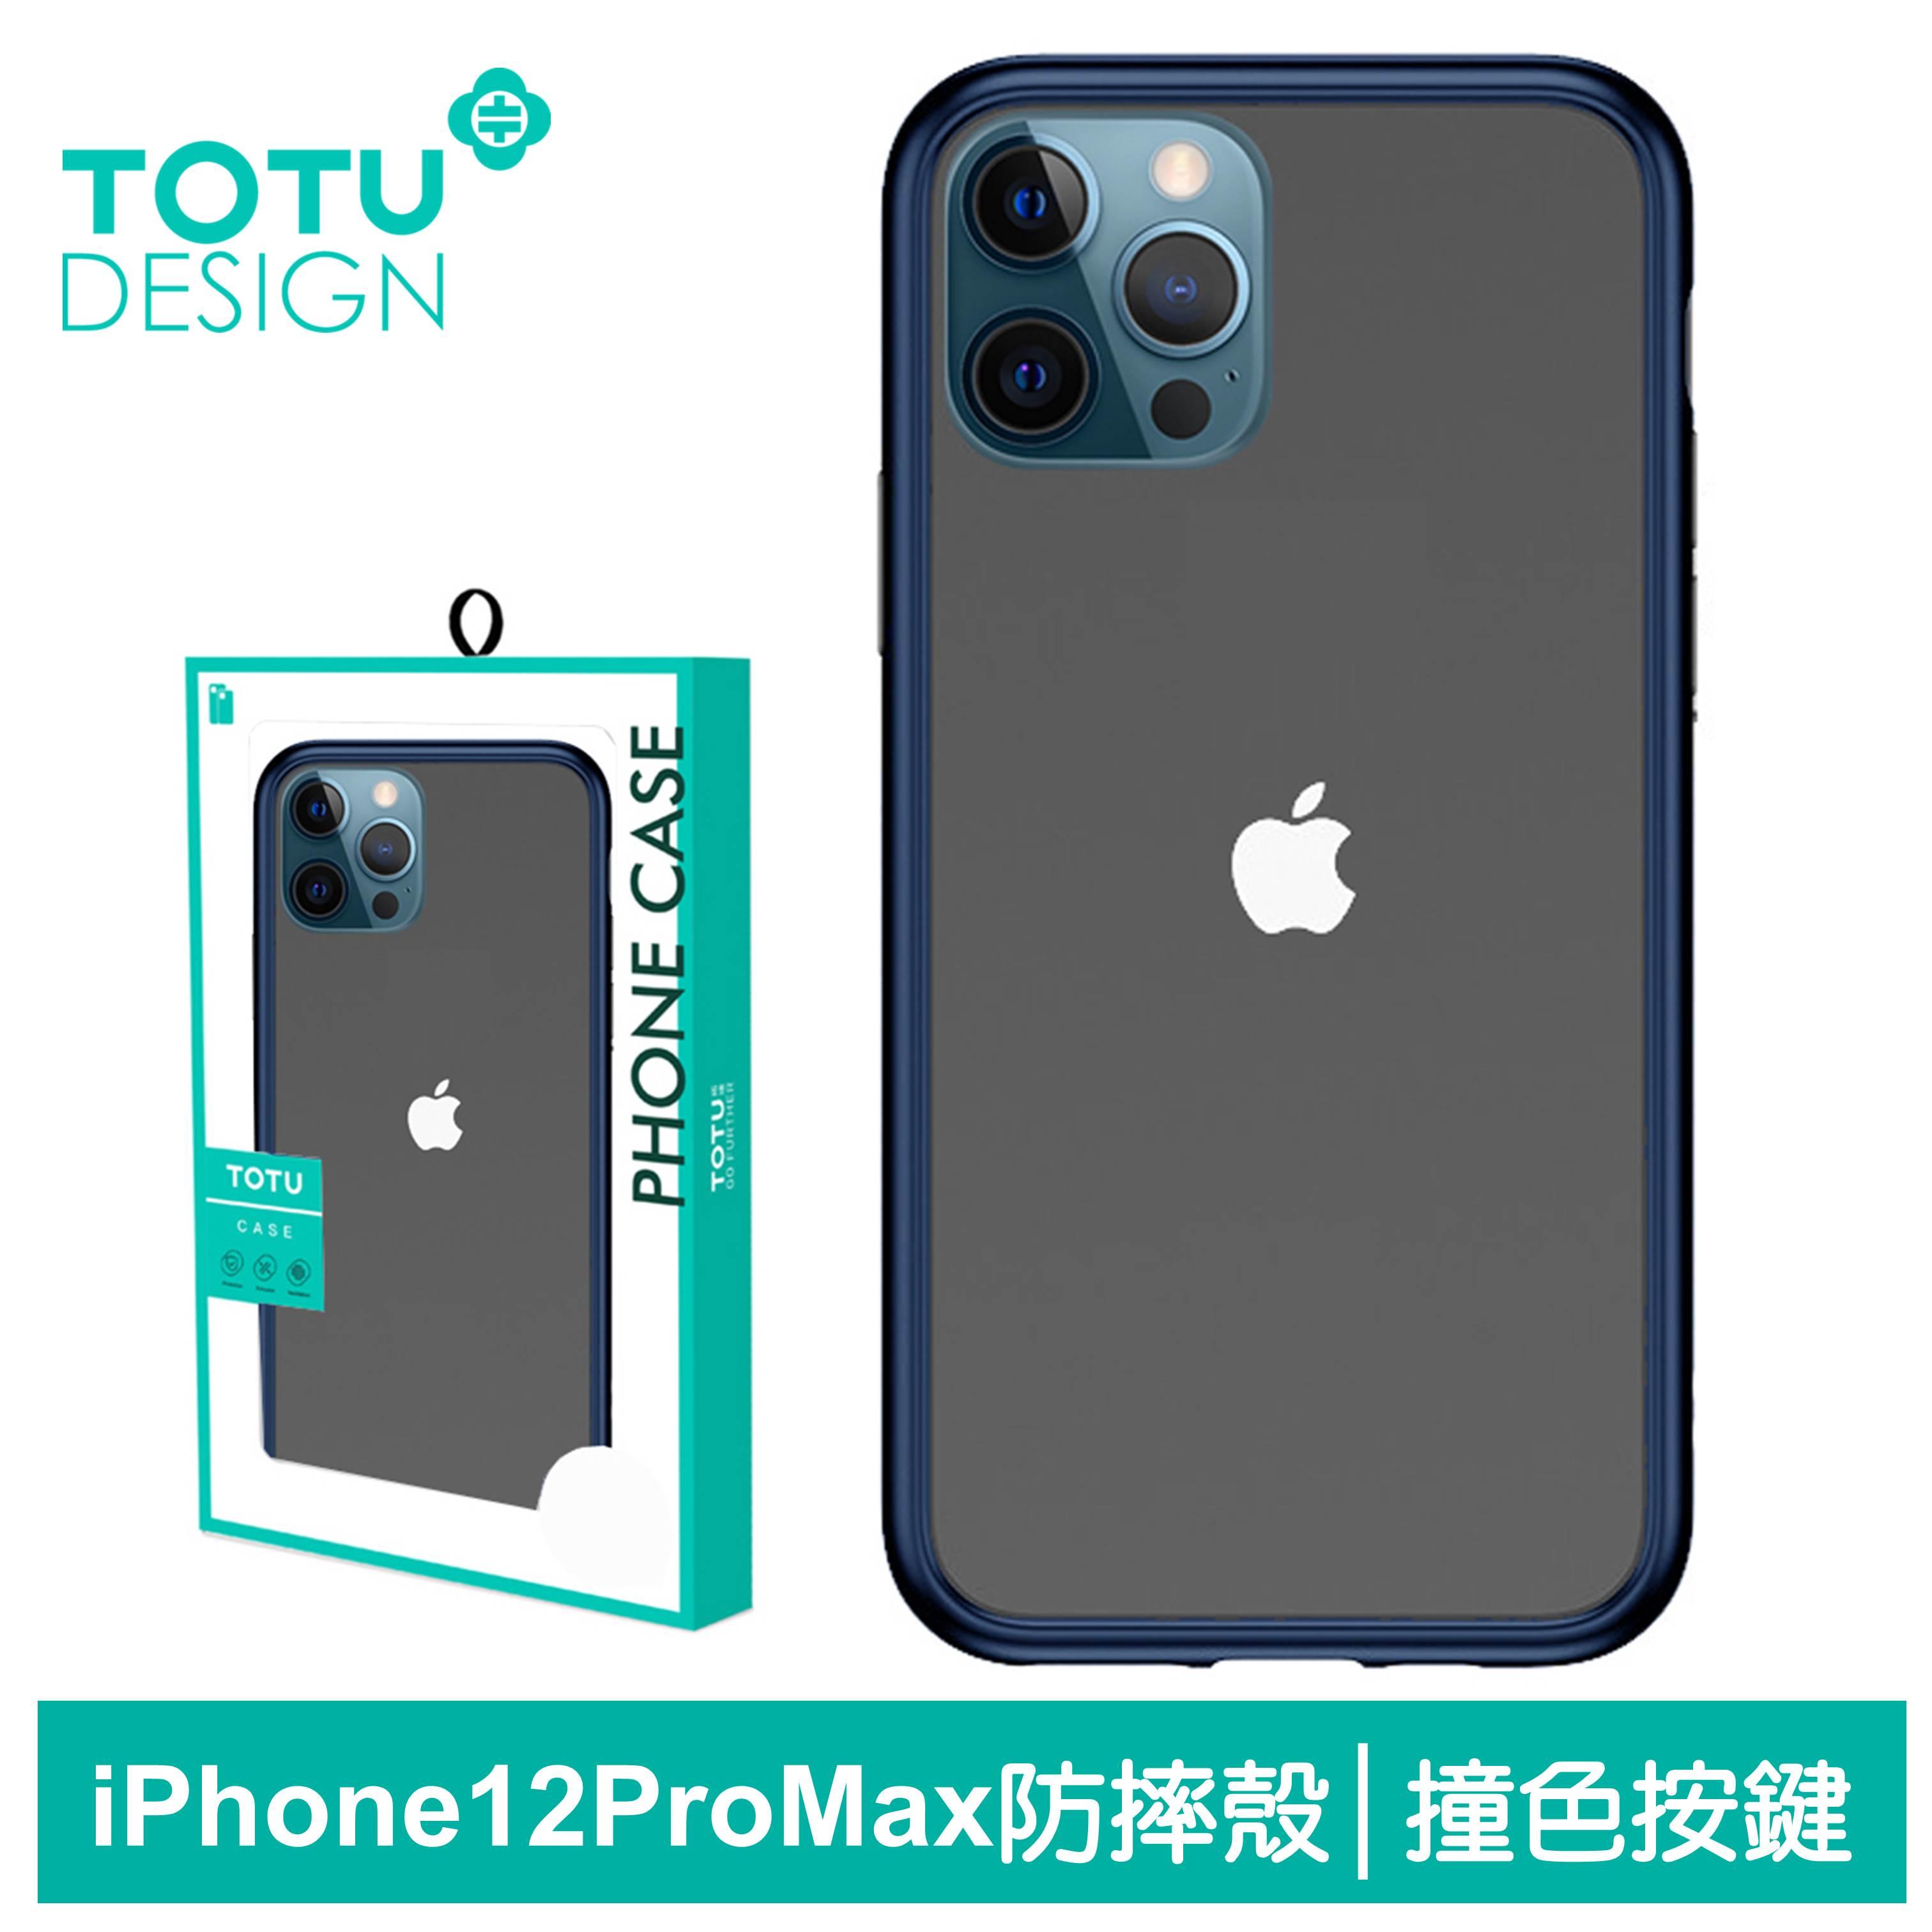 TOTU台灣官方 iPhone 12 Pro Max 手機殼 i12ProMax 保護殼 6.7吋 防摔殼 撞色按鍵 晶剛系列 藍色